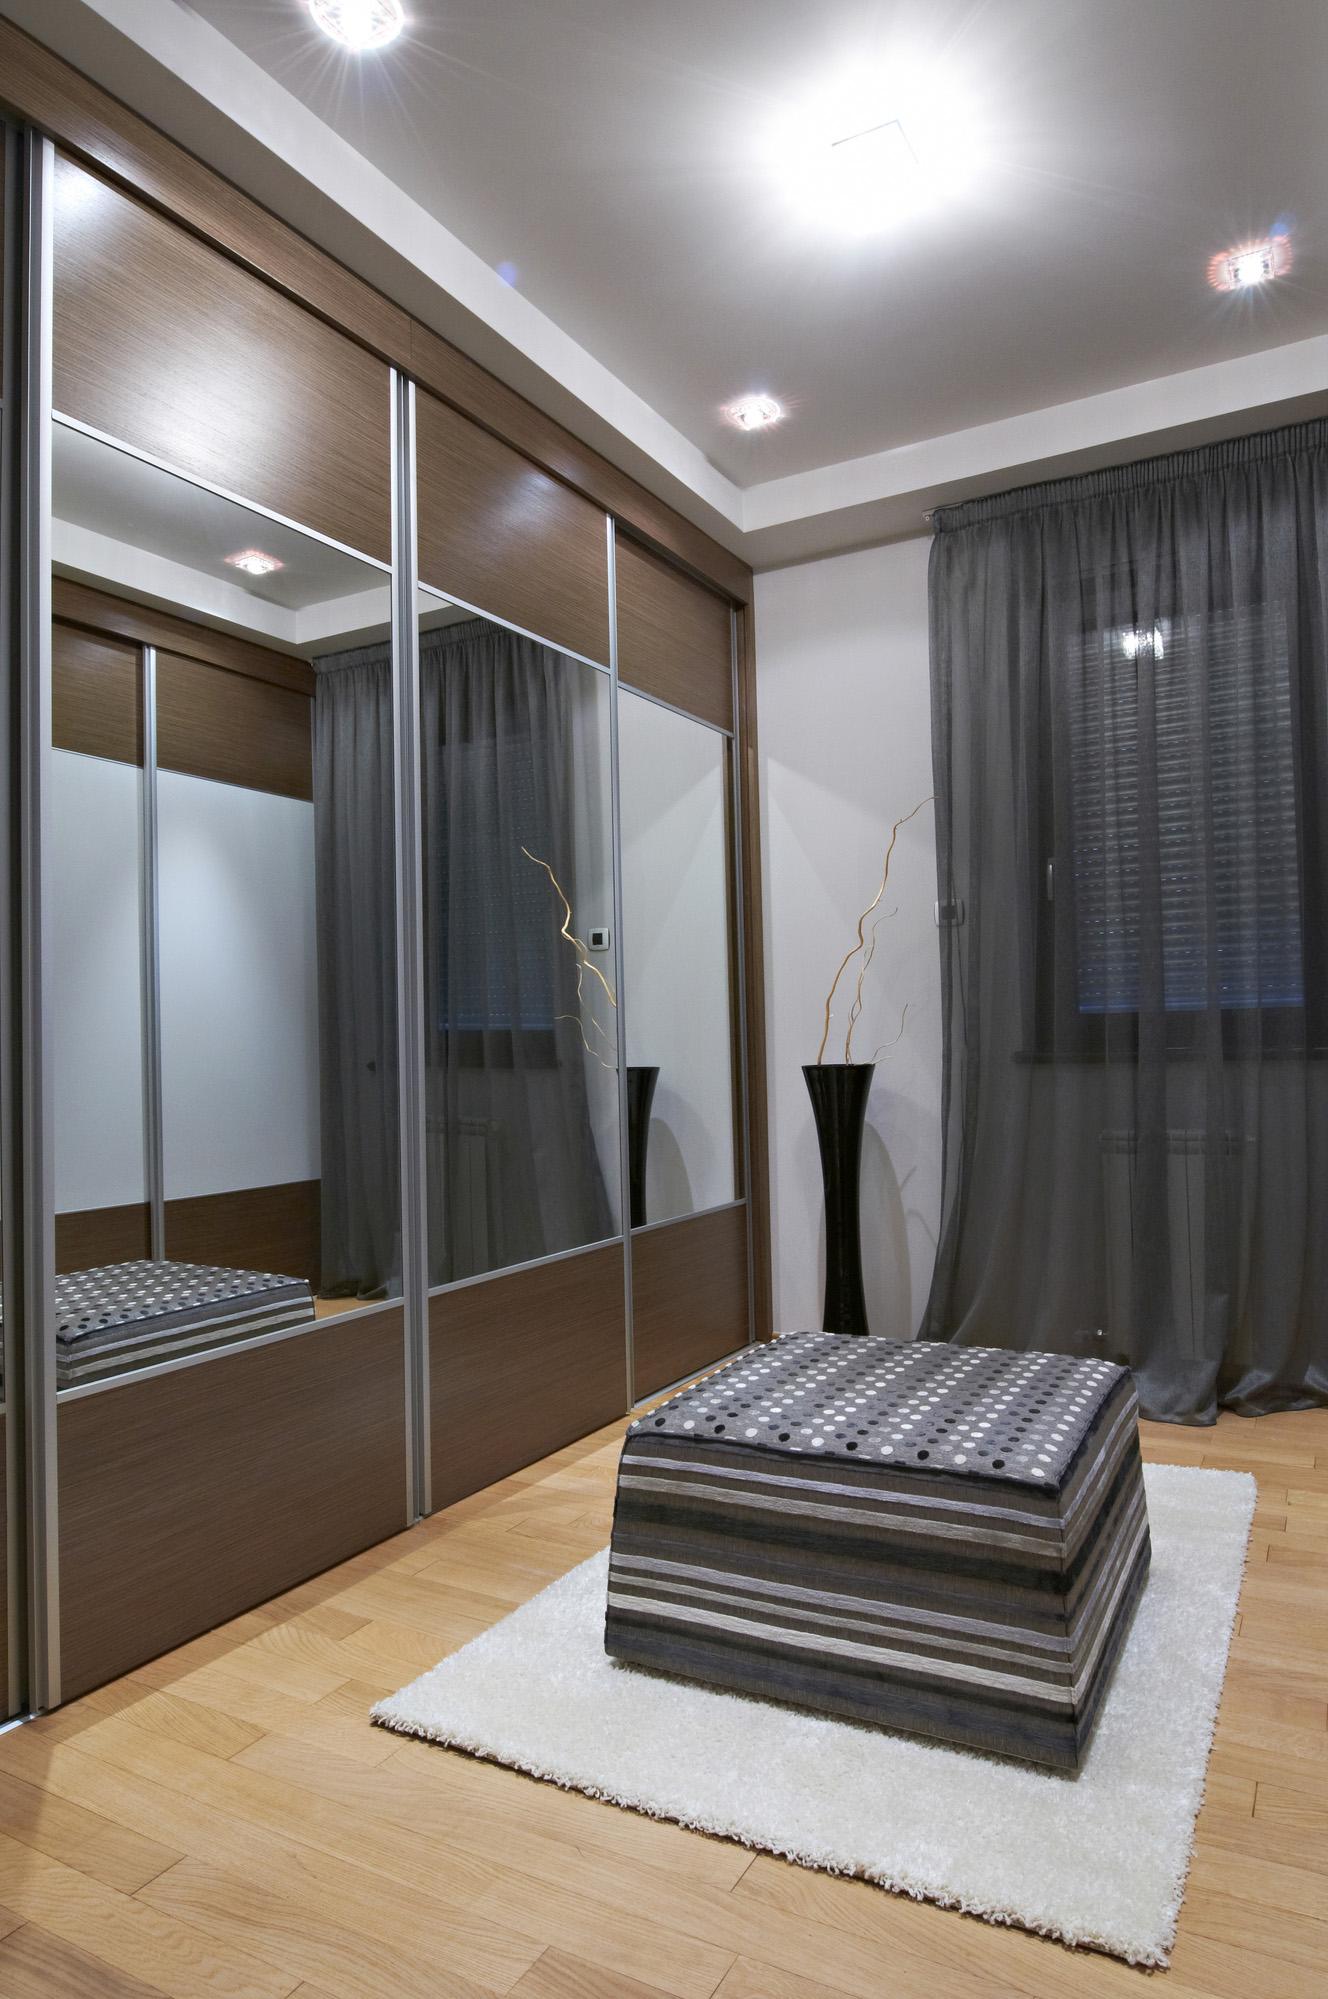 sliding mirrored wardrobe designs, fitted wardrobes